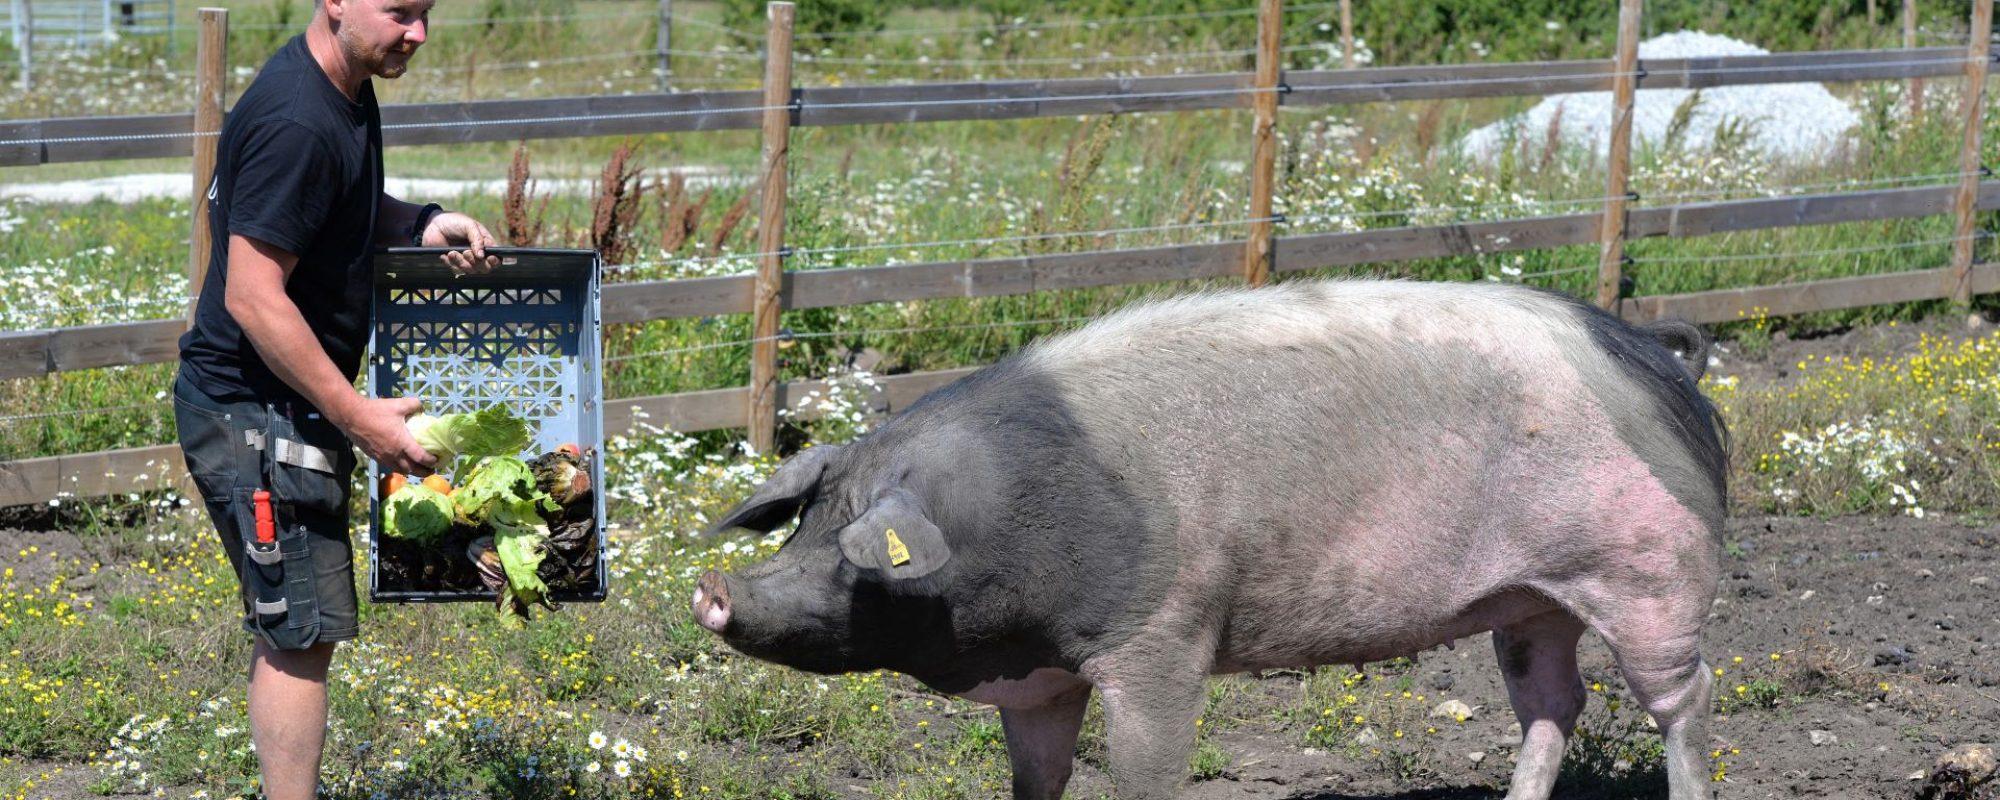 GotlandsDjurpark Piggham Gris